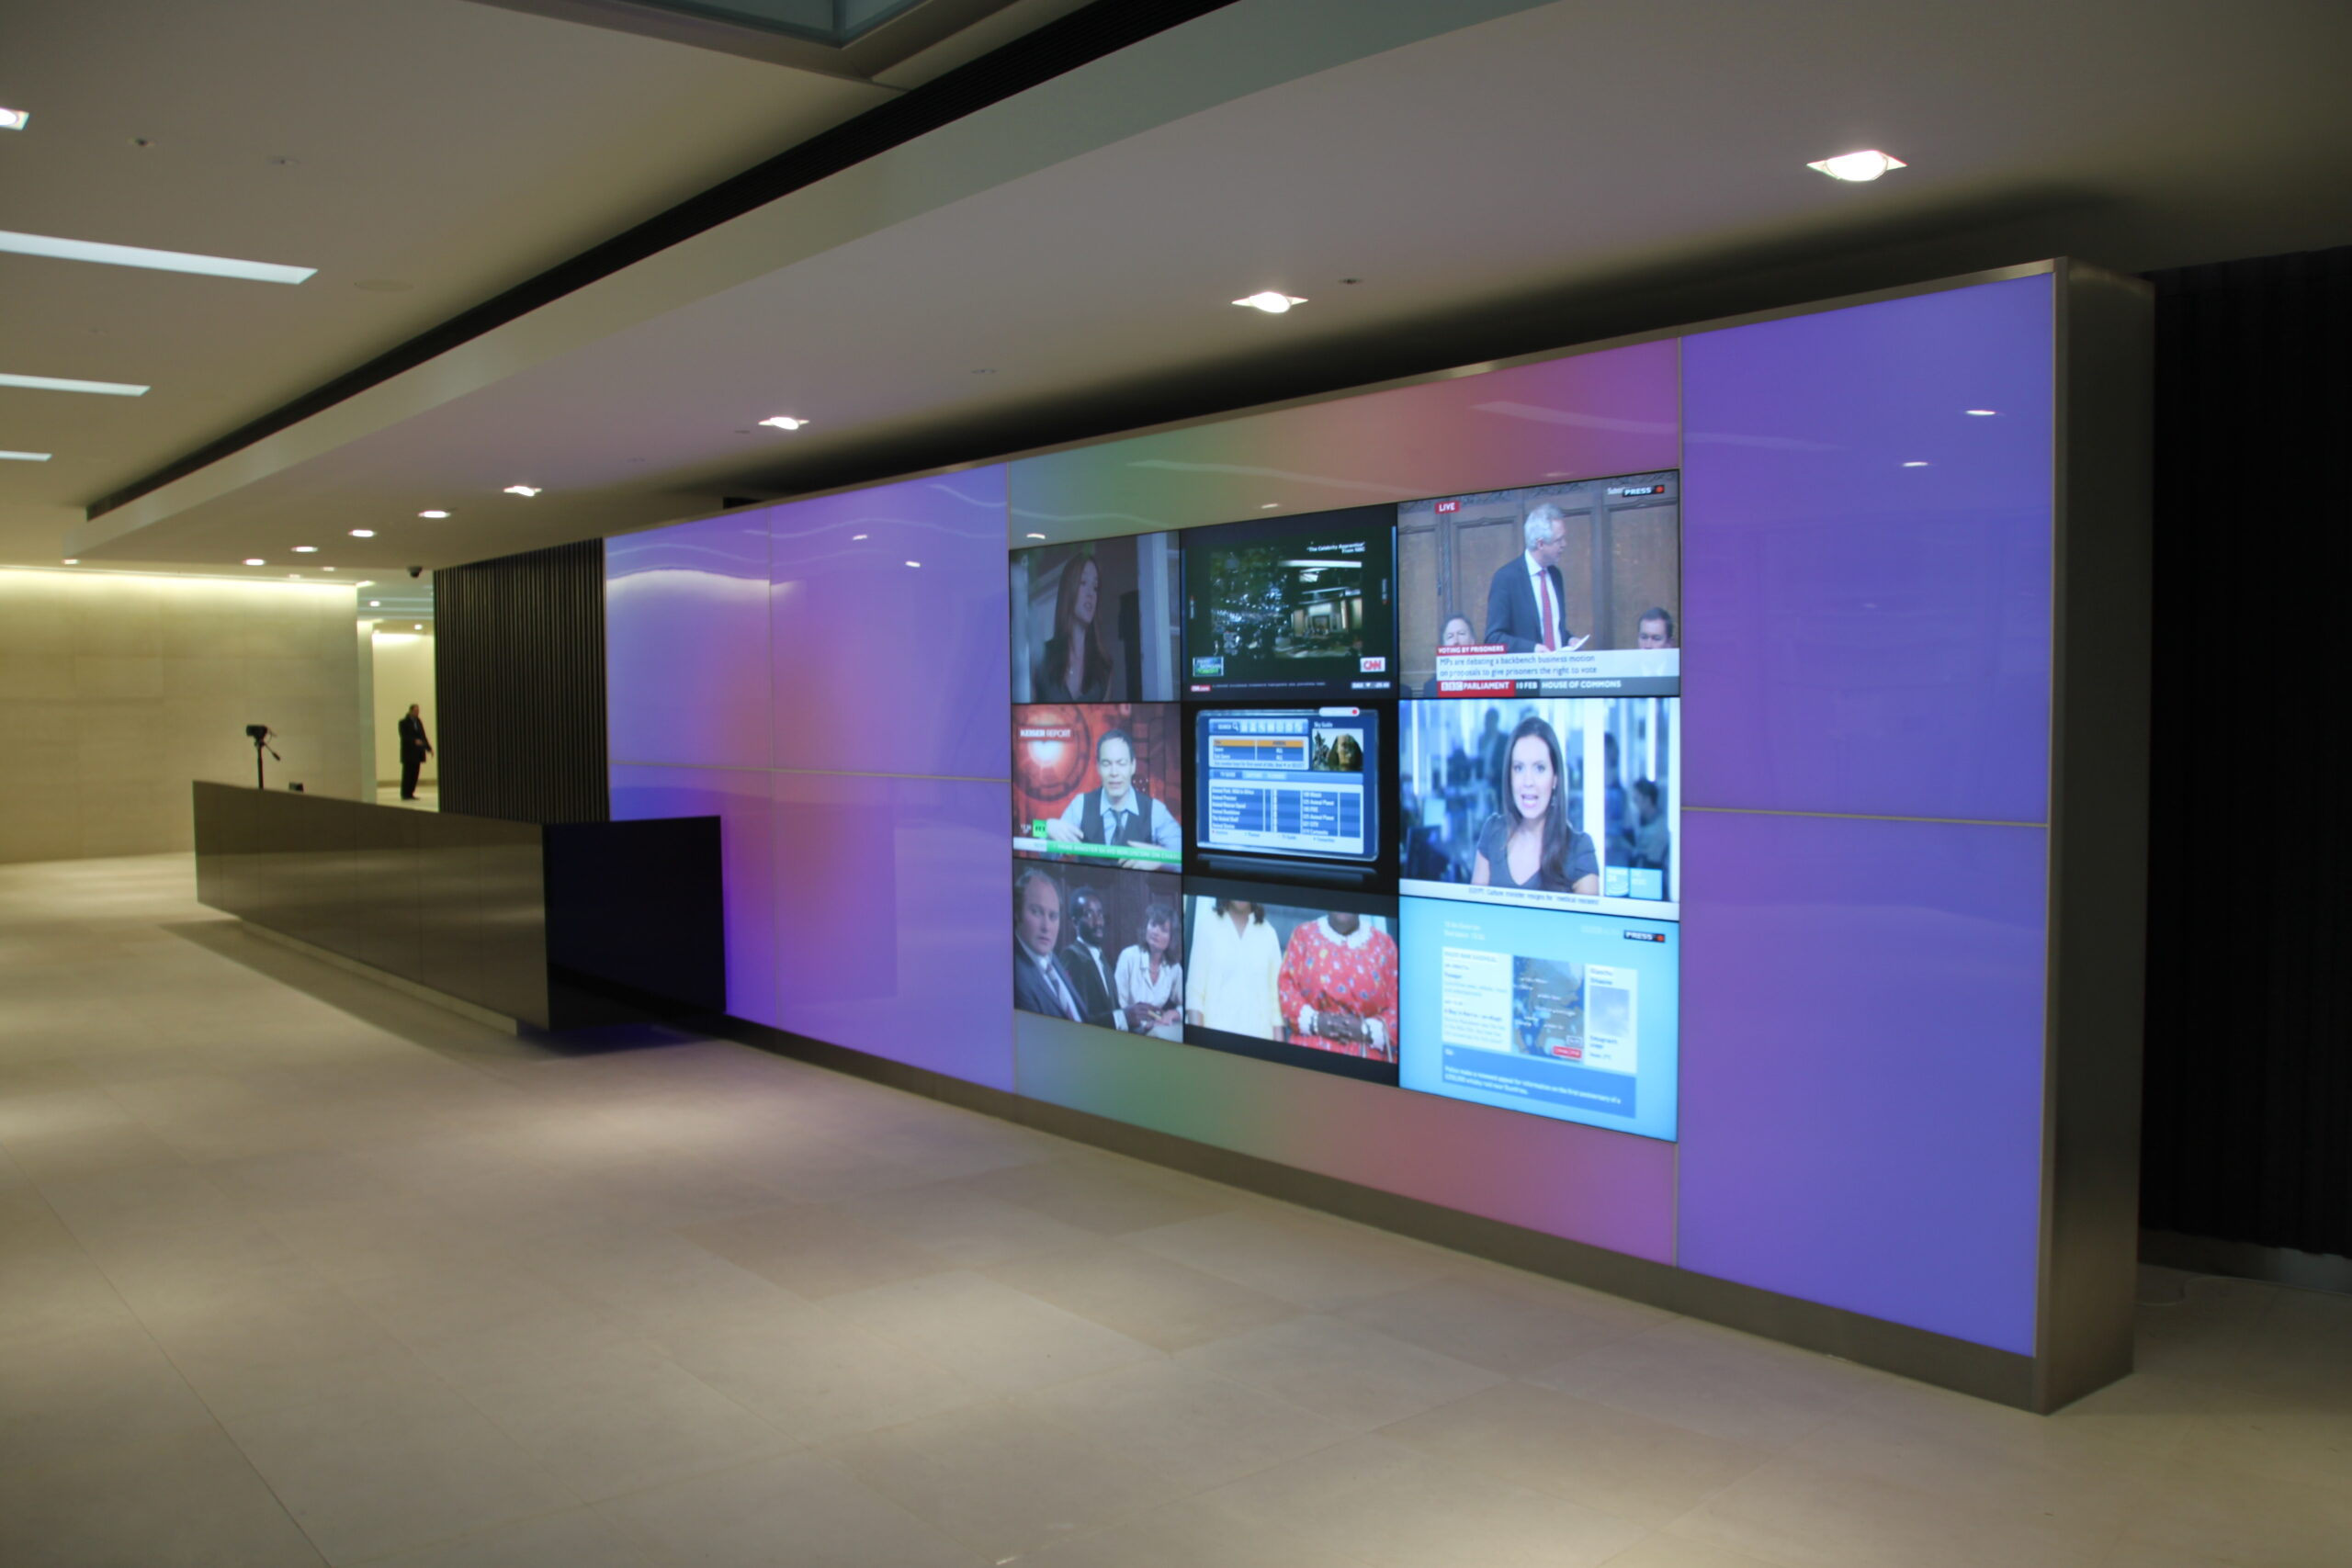 LTP Integration - 110 Fetter Lane - Exterior and Interior Lighting for Buildings